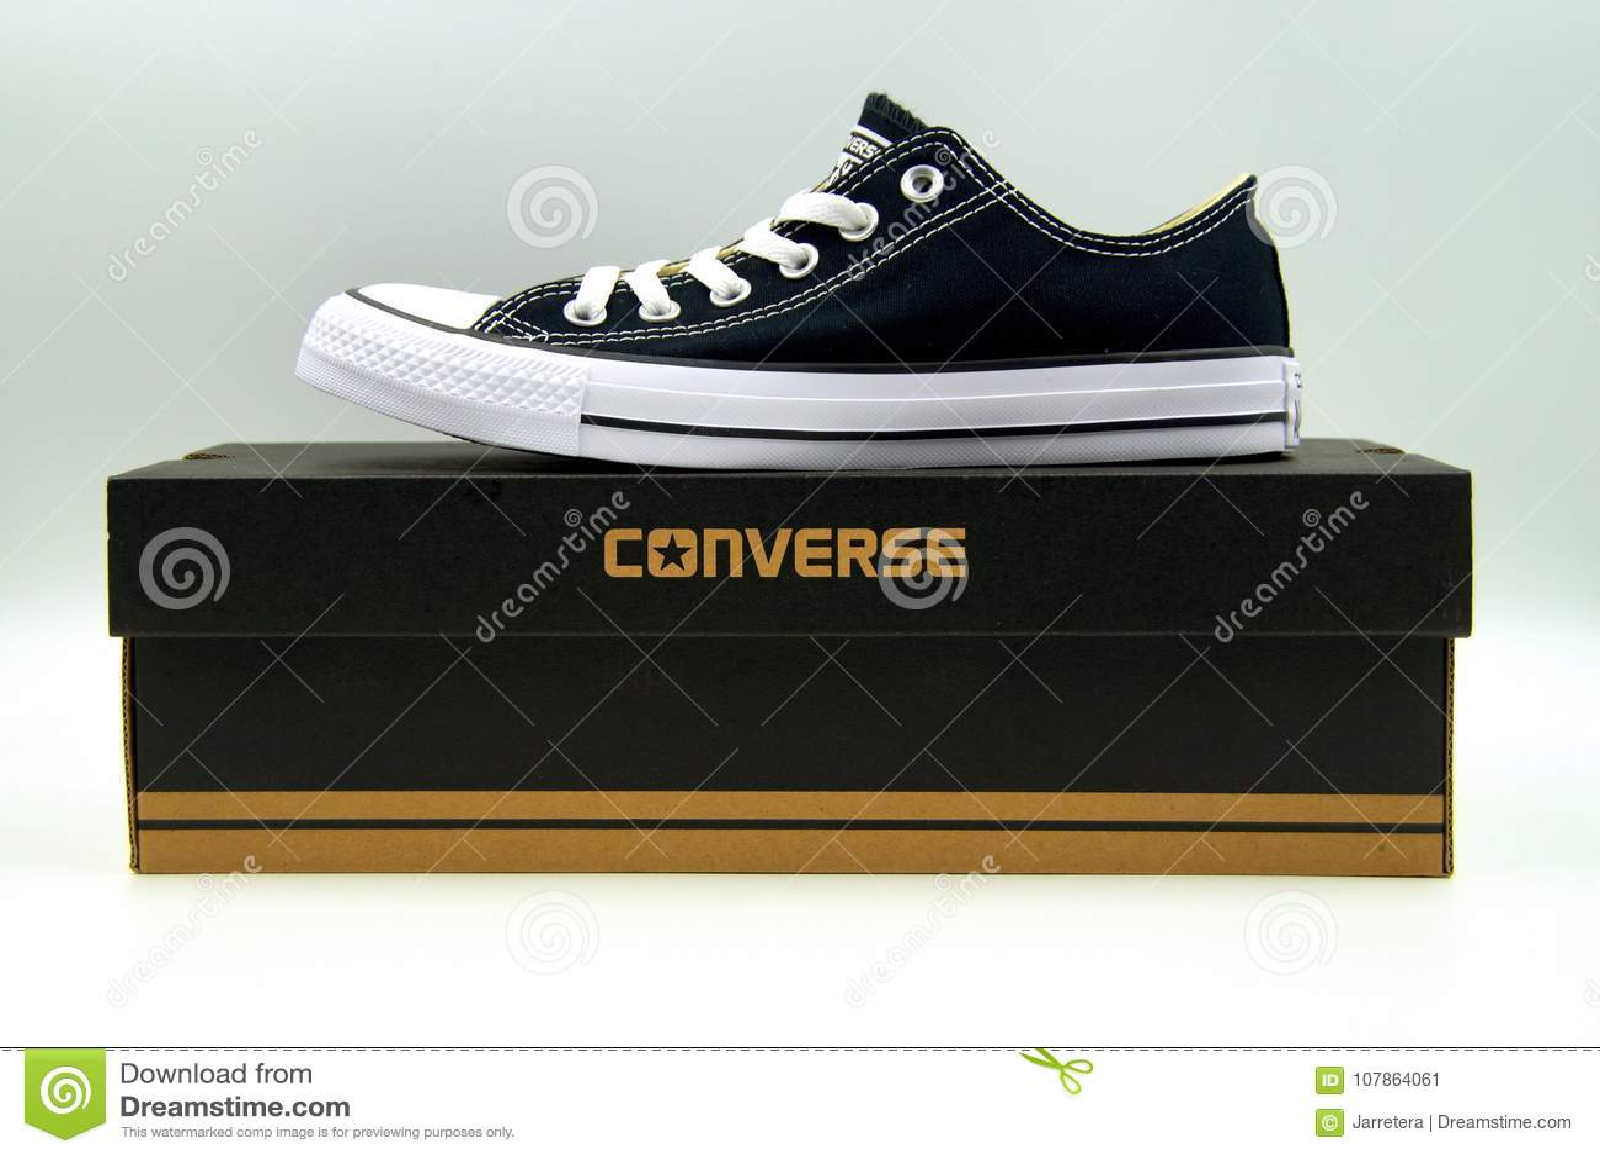 boite chaussure converse